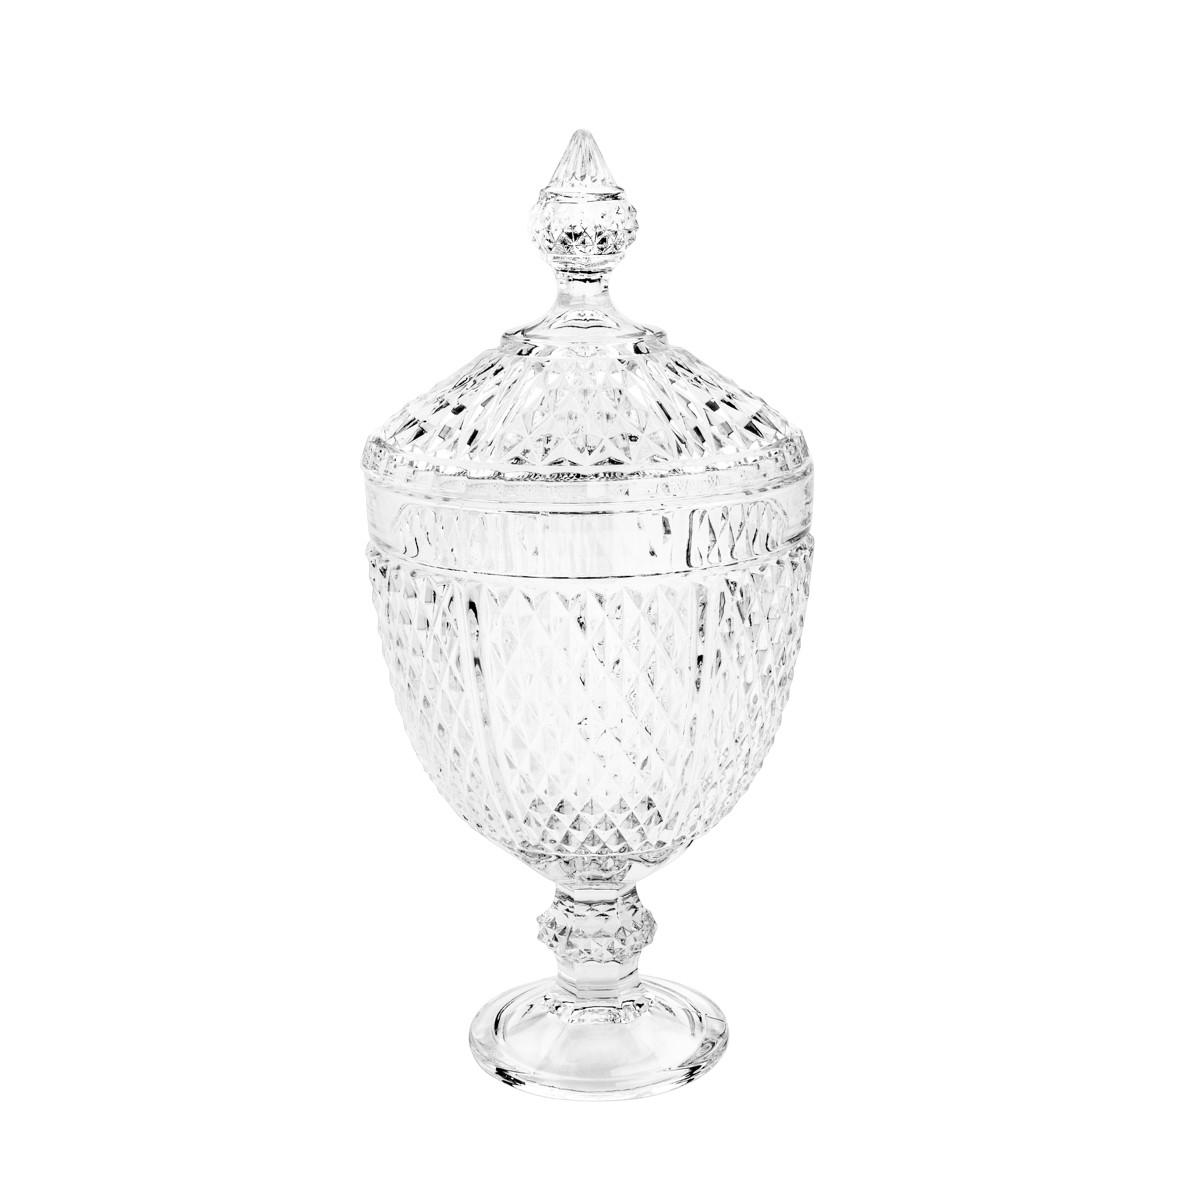 Potiche Decorativo C/ Pé De Cristal Perseu Lyor